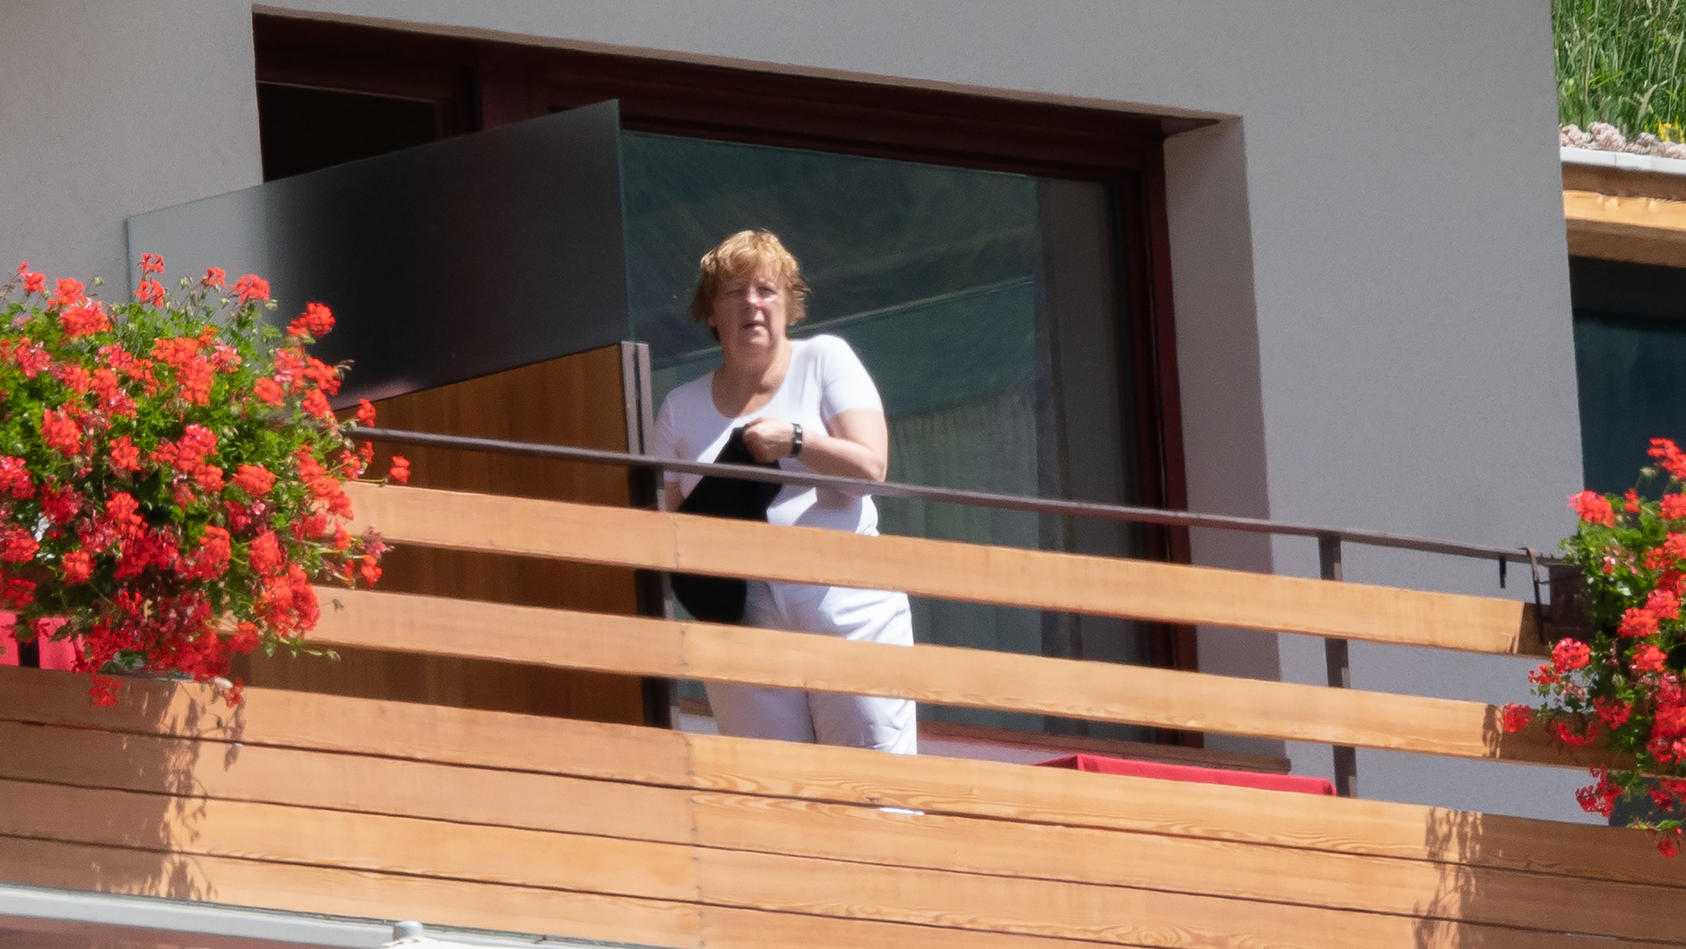 Bundeskanzlerin Angela Merkel entspannt im Urlaub in Südtirol. (Foto: MEGA)